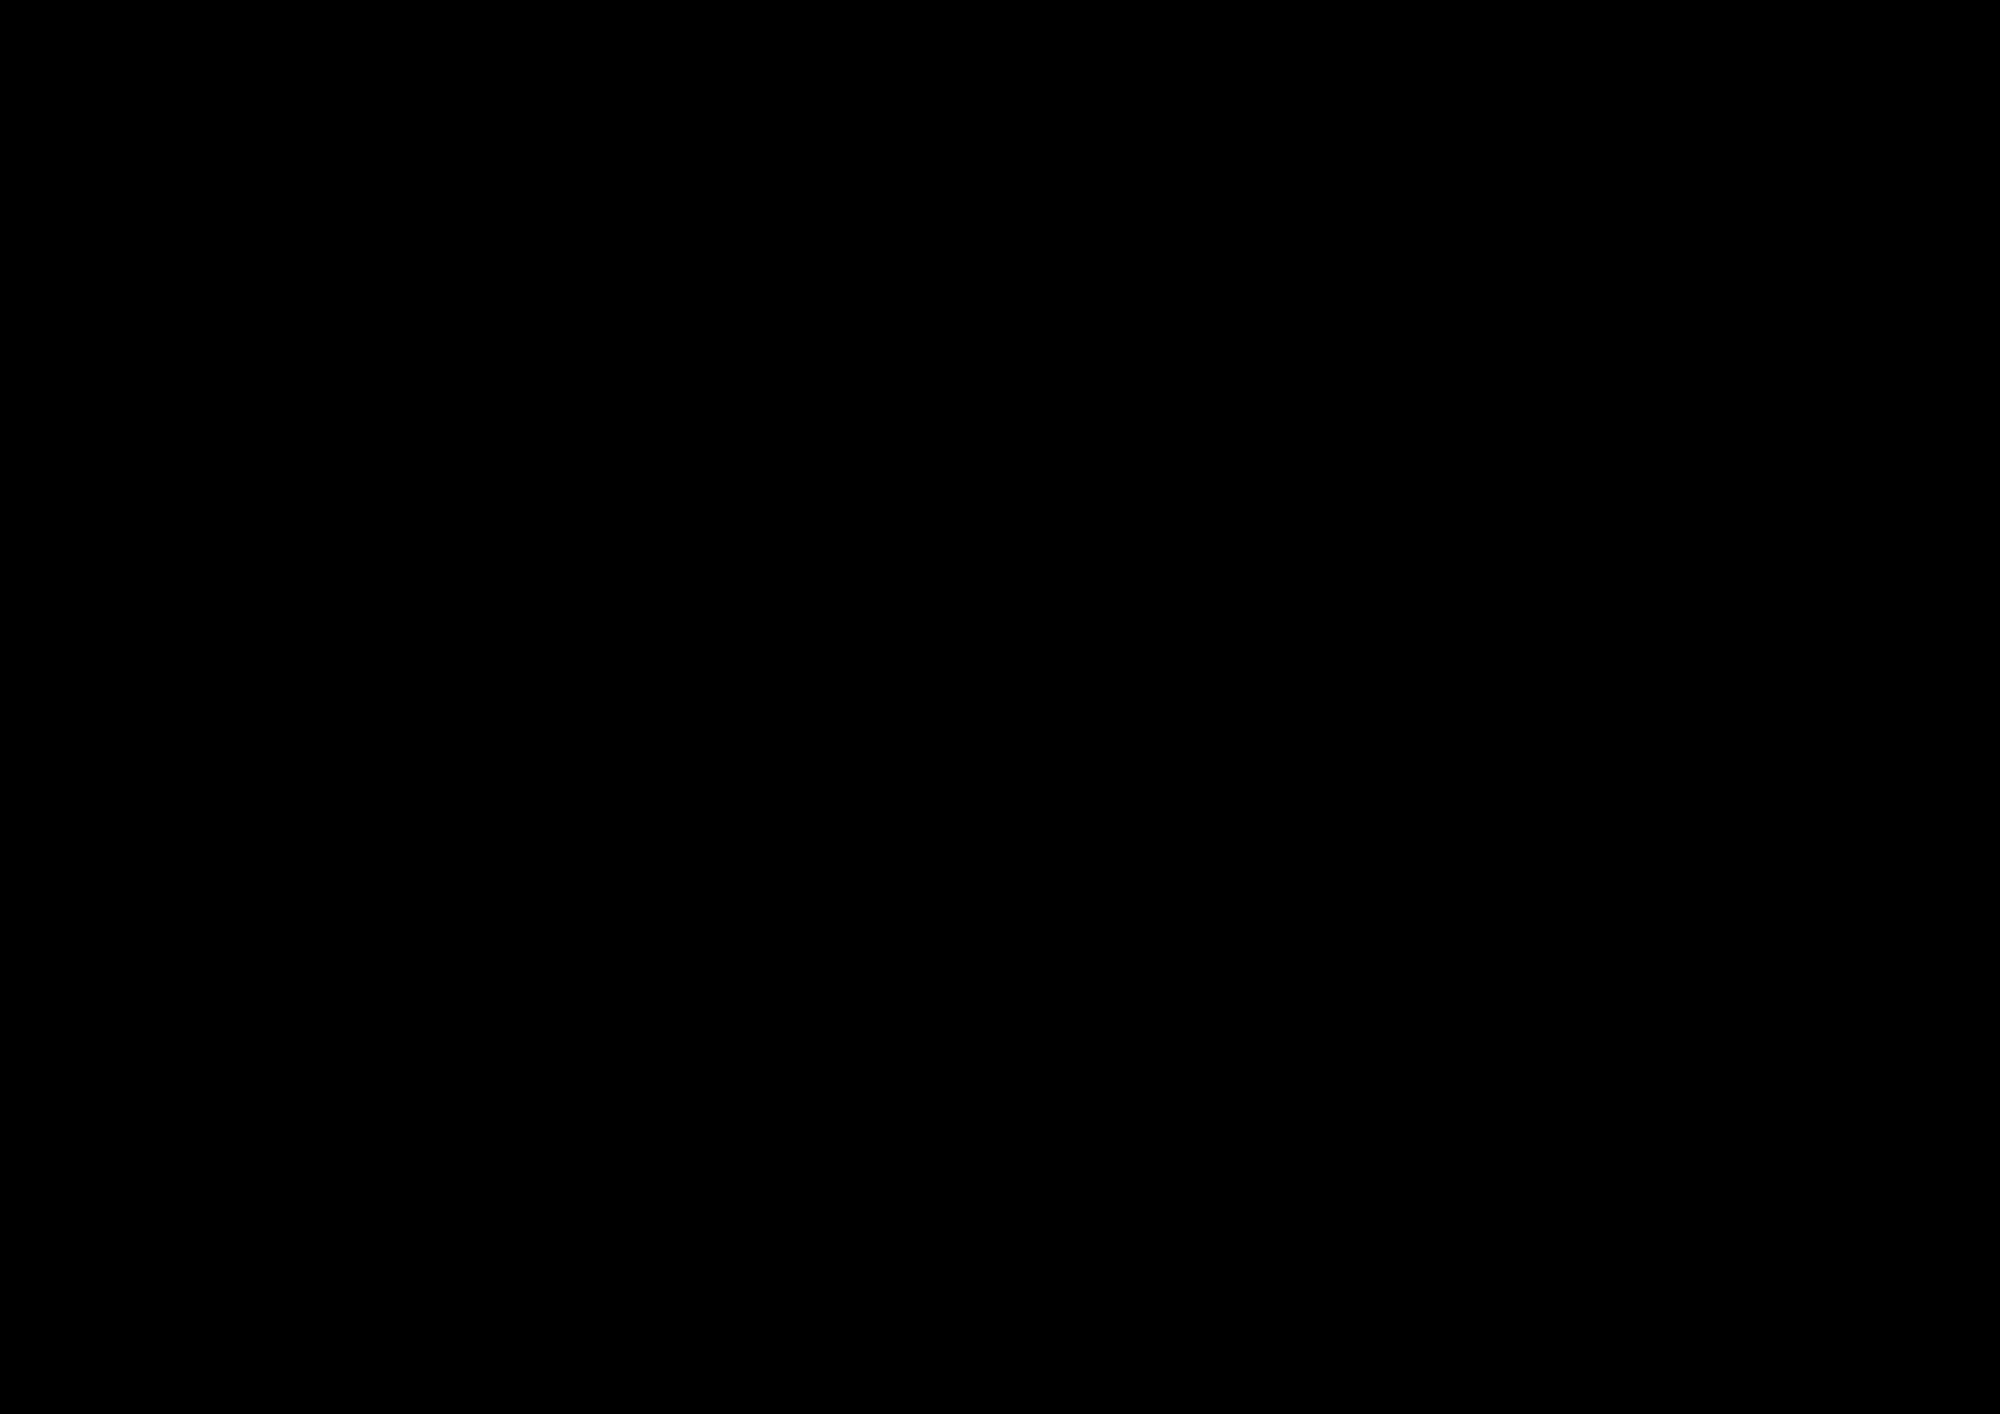 Logo Overload!